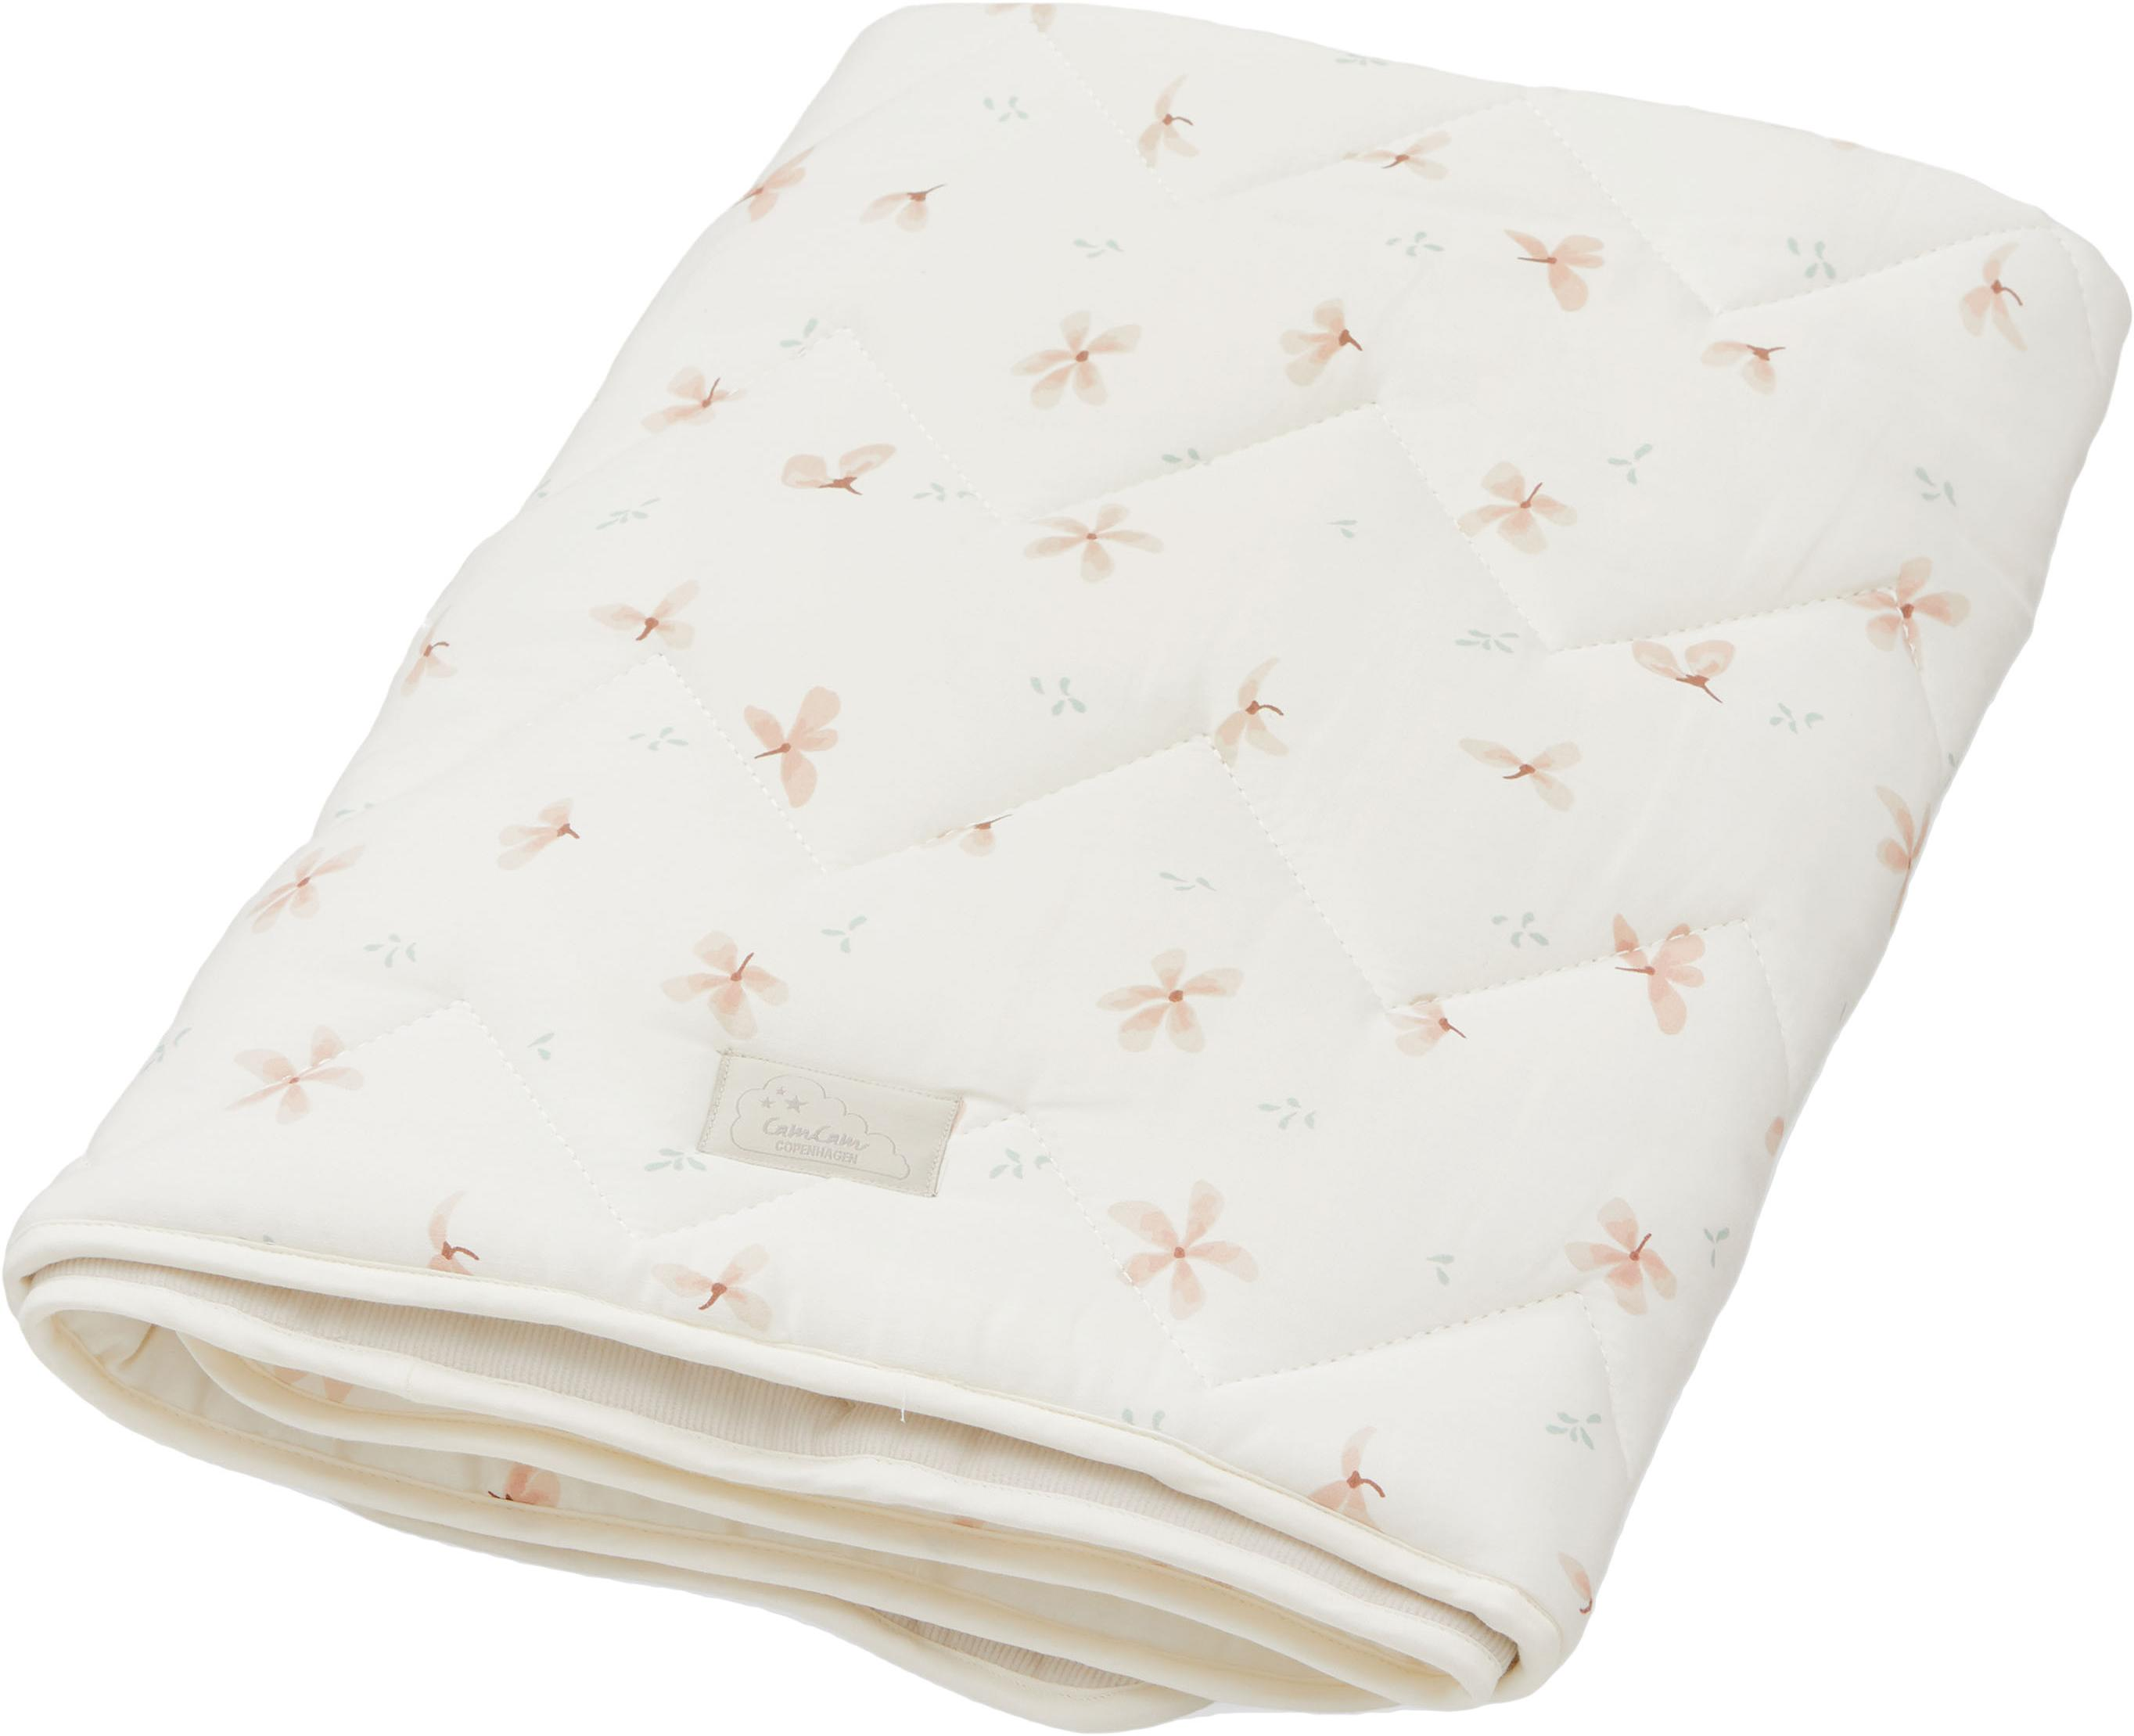 Cubrecolchón cuna de algodón ecológico Wildflower, Funda: 100%algodón ecológico, c, Crema, rosa, An 100 x L 100 cm